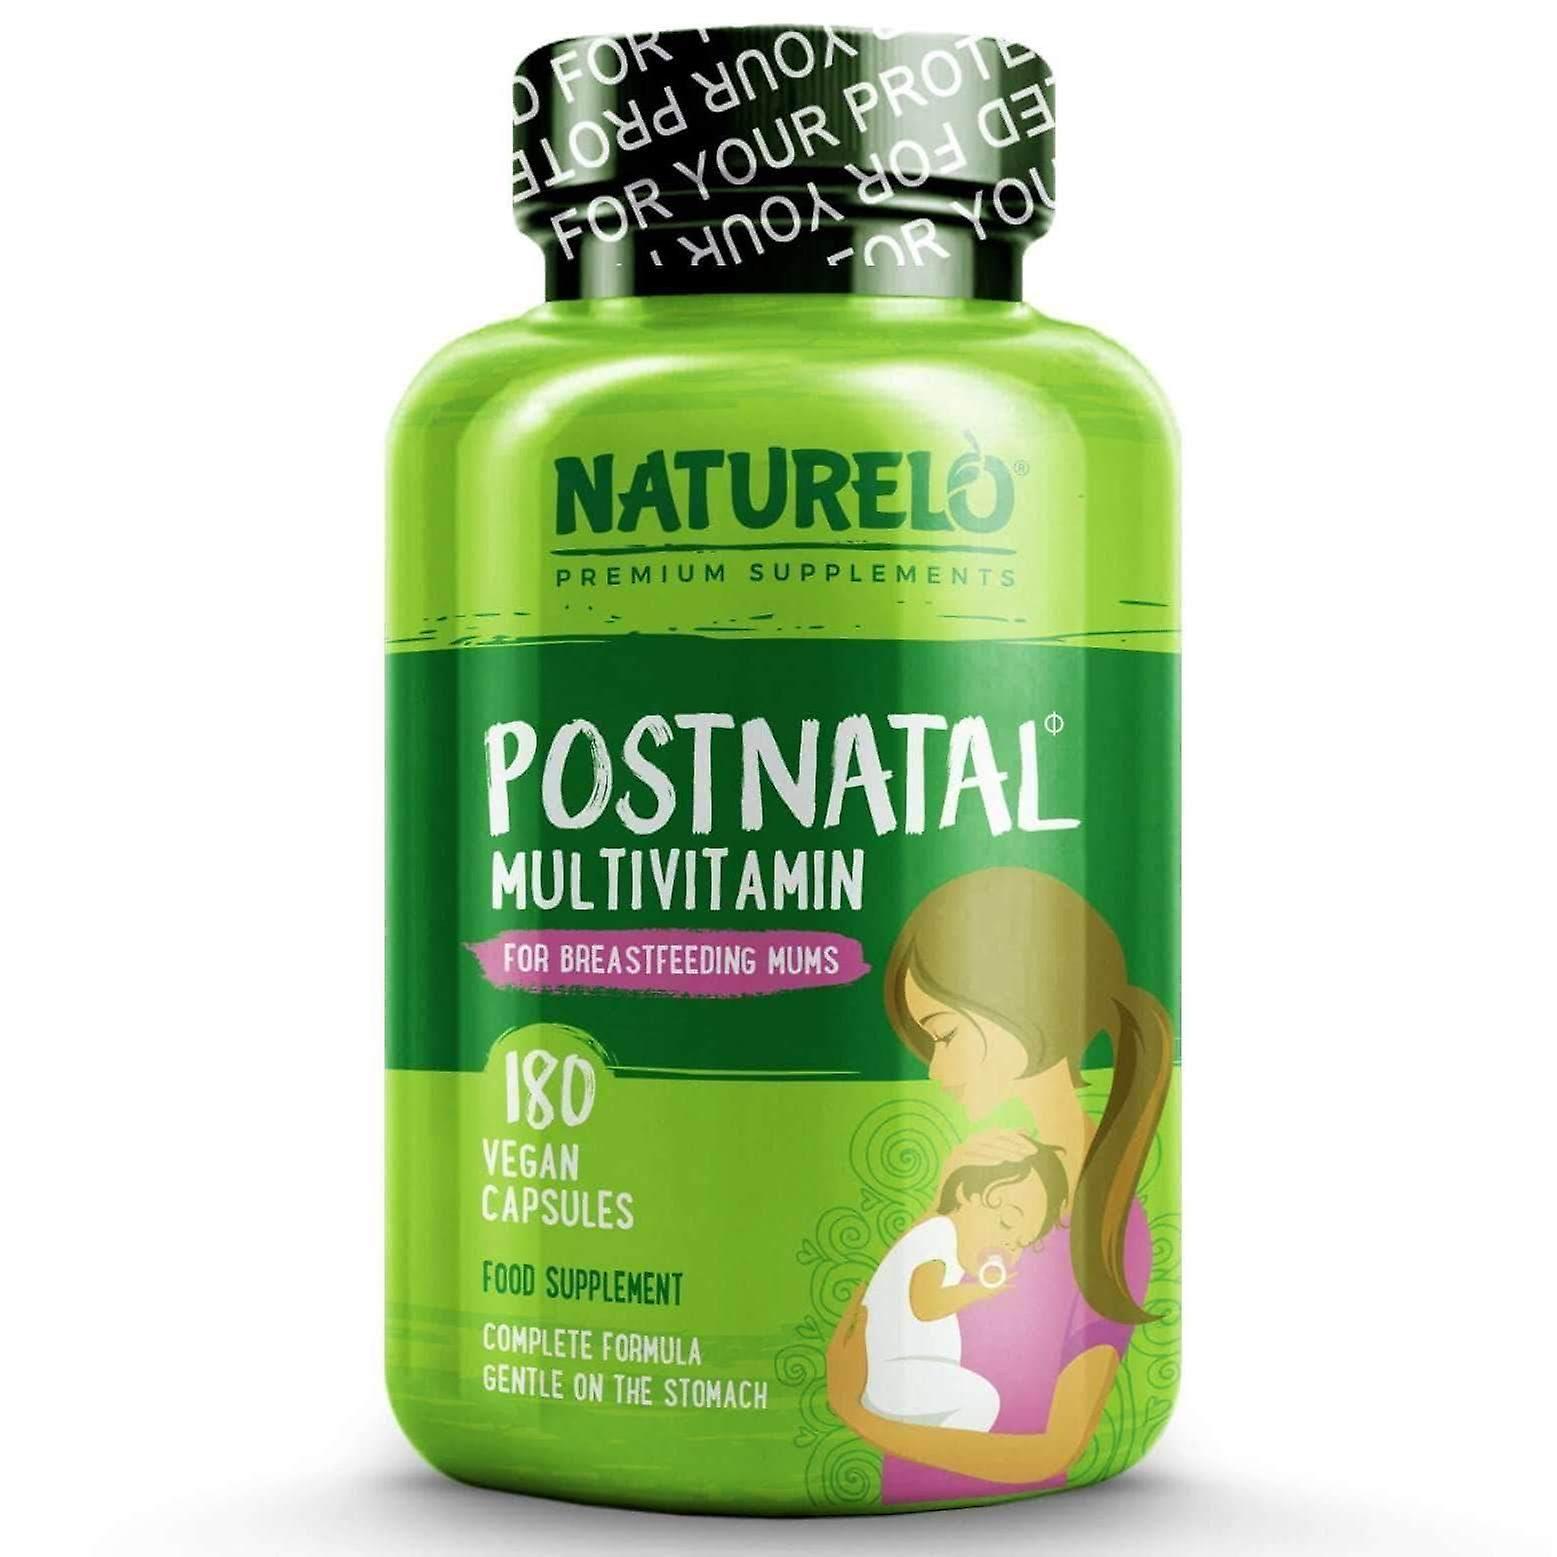 Postnatal hele mat multivitamin for nye mødre med naturlige vitaminer og urter-180 caps (vegan)